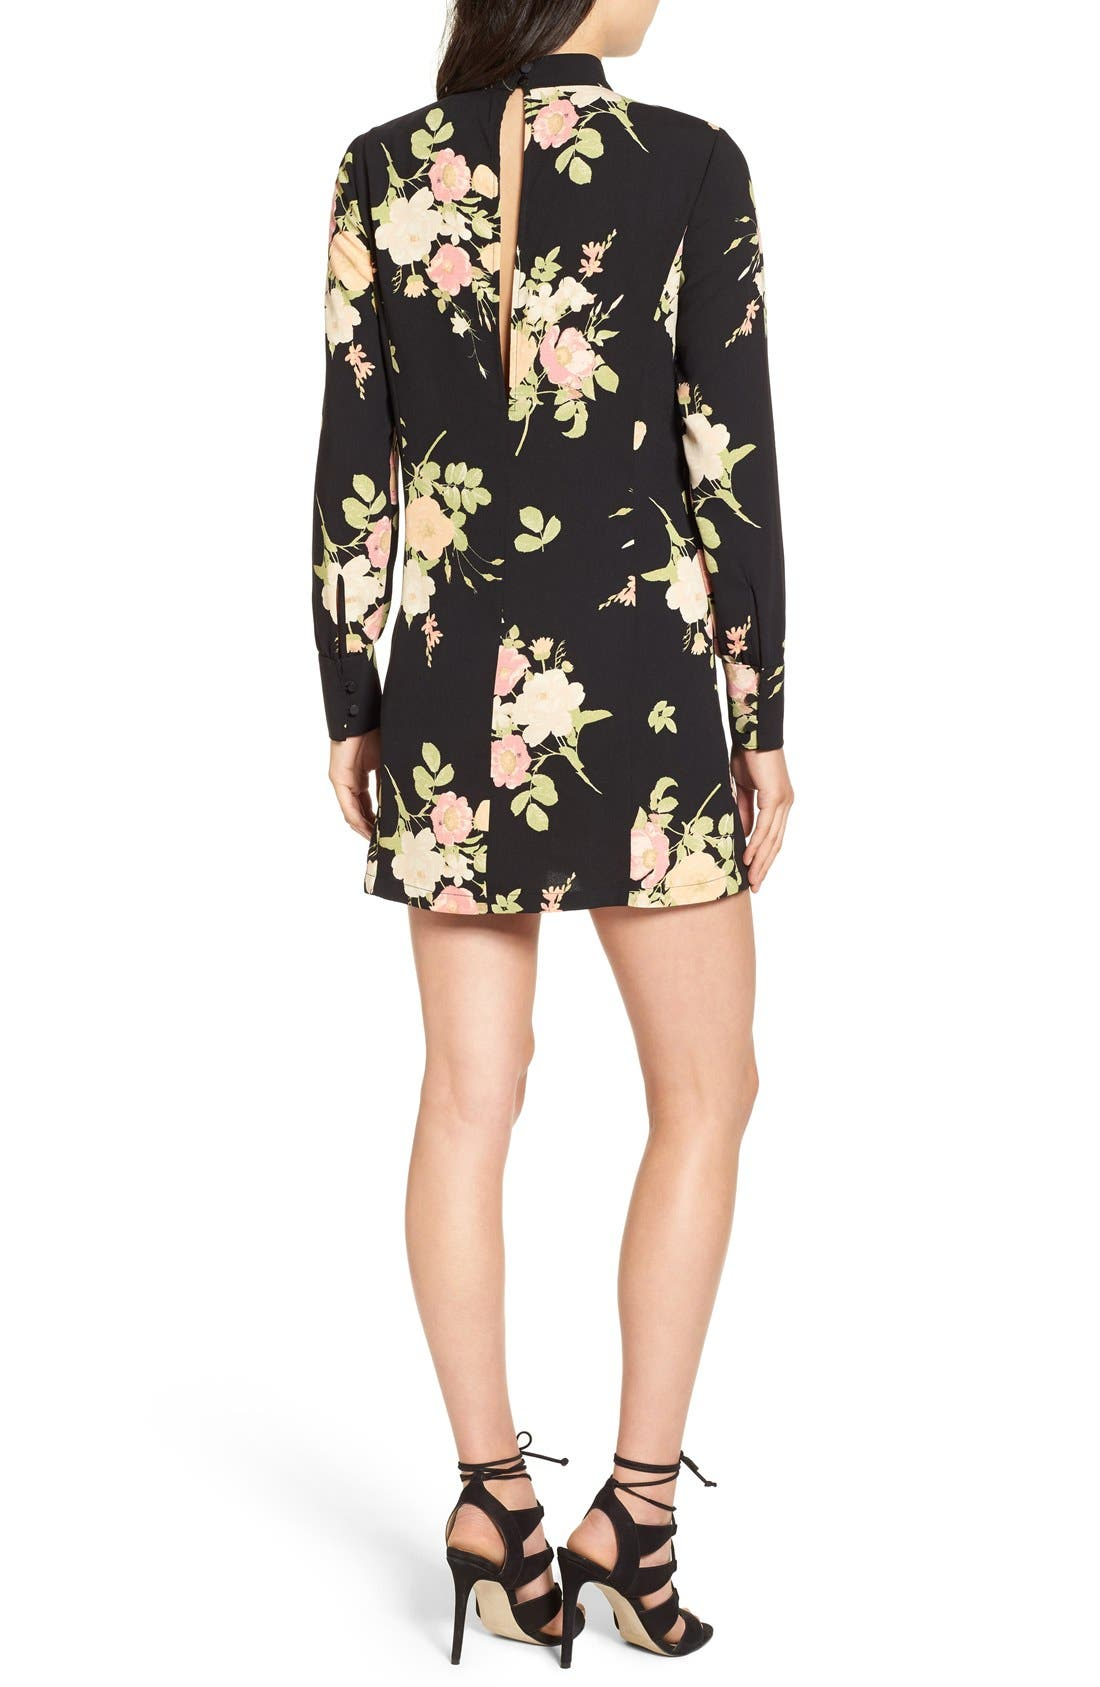 LEITH, Floral Print Mock Neck Shift Dress, Alternate thumbnail 6, color, 001